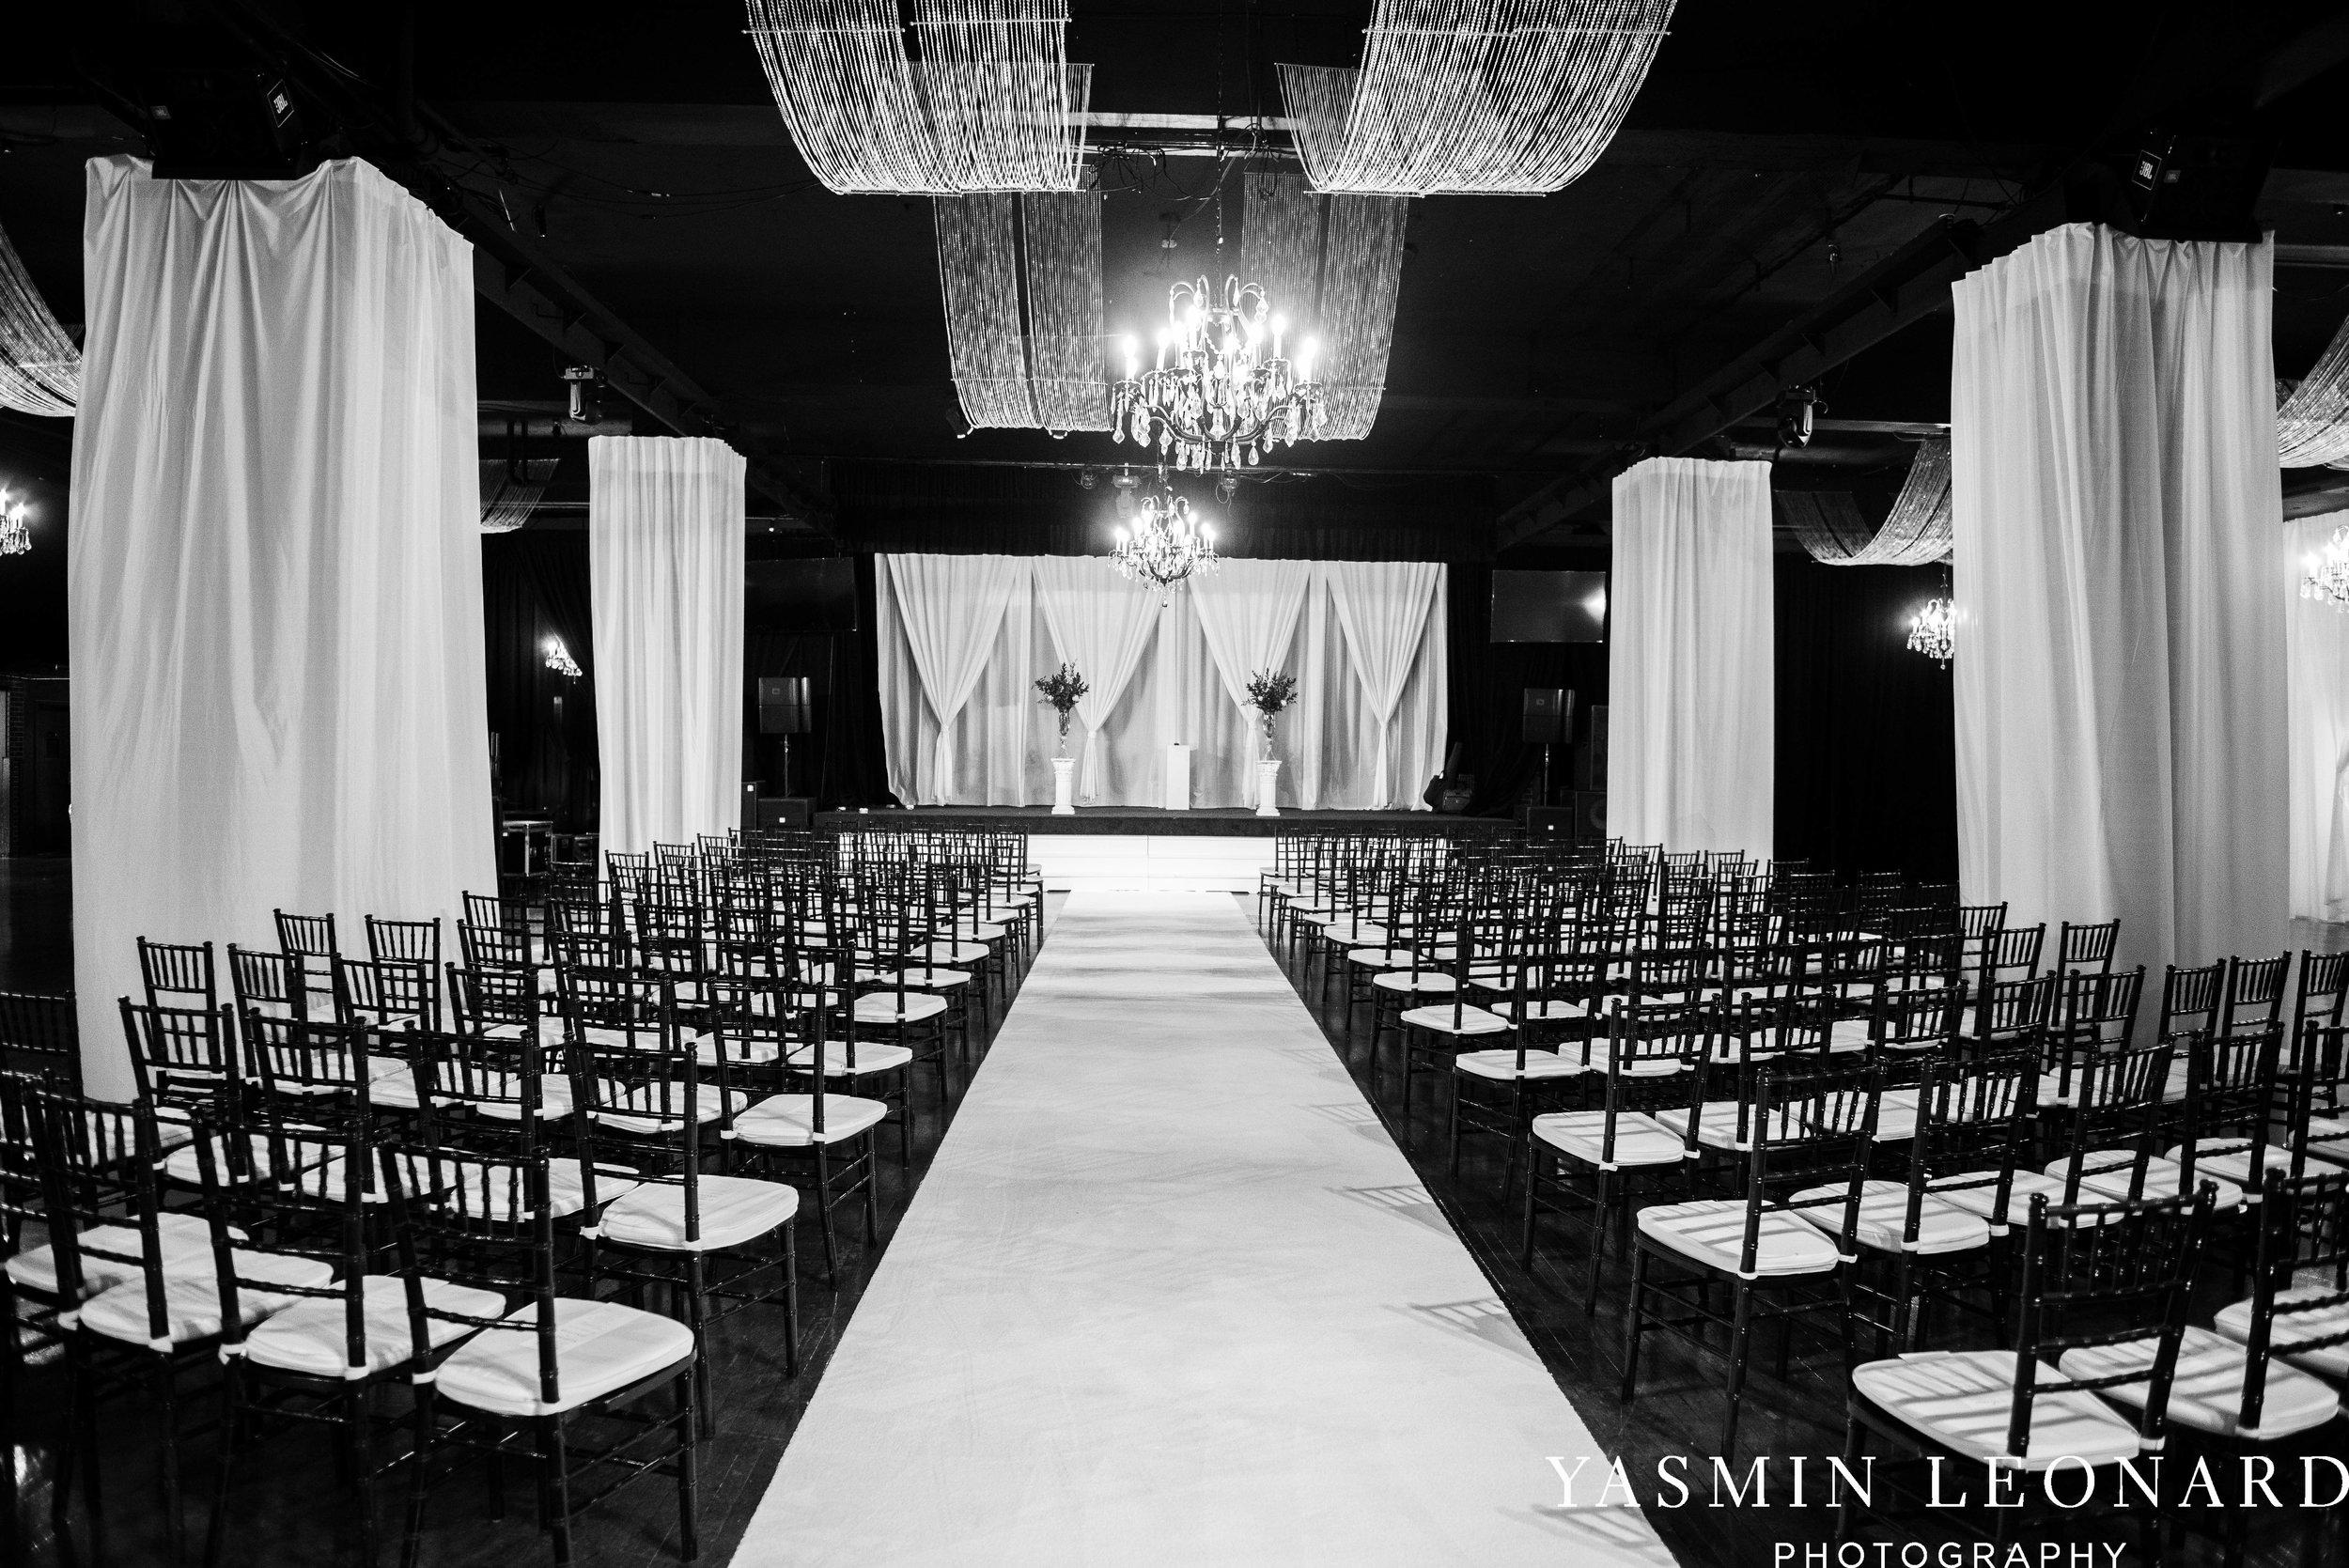 Millennium Center Wedding - Downtown Winston Salem - Winston Salem Wedding Photographer - Winston Salem Venues - Indoor Wedding Venues - NC Wedding Photographer - Yasmin Leonard Photography-34.jpg